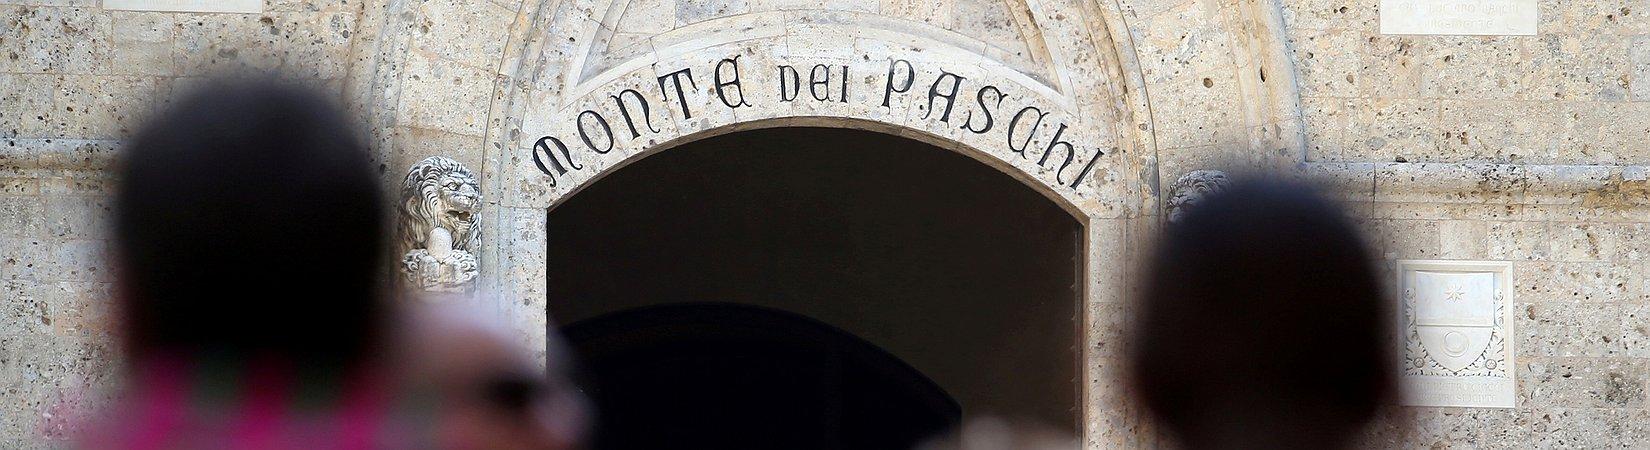 Italian banks slump as Renzi loses referendum vote. What next?